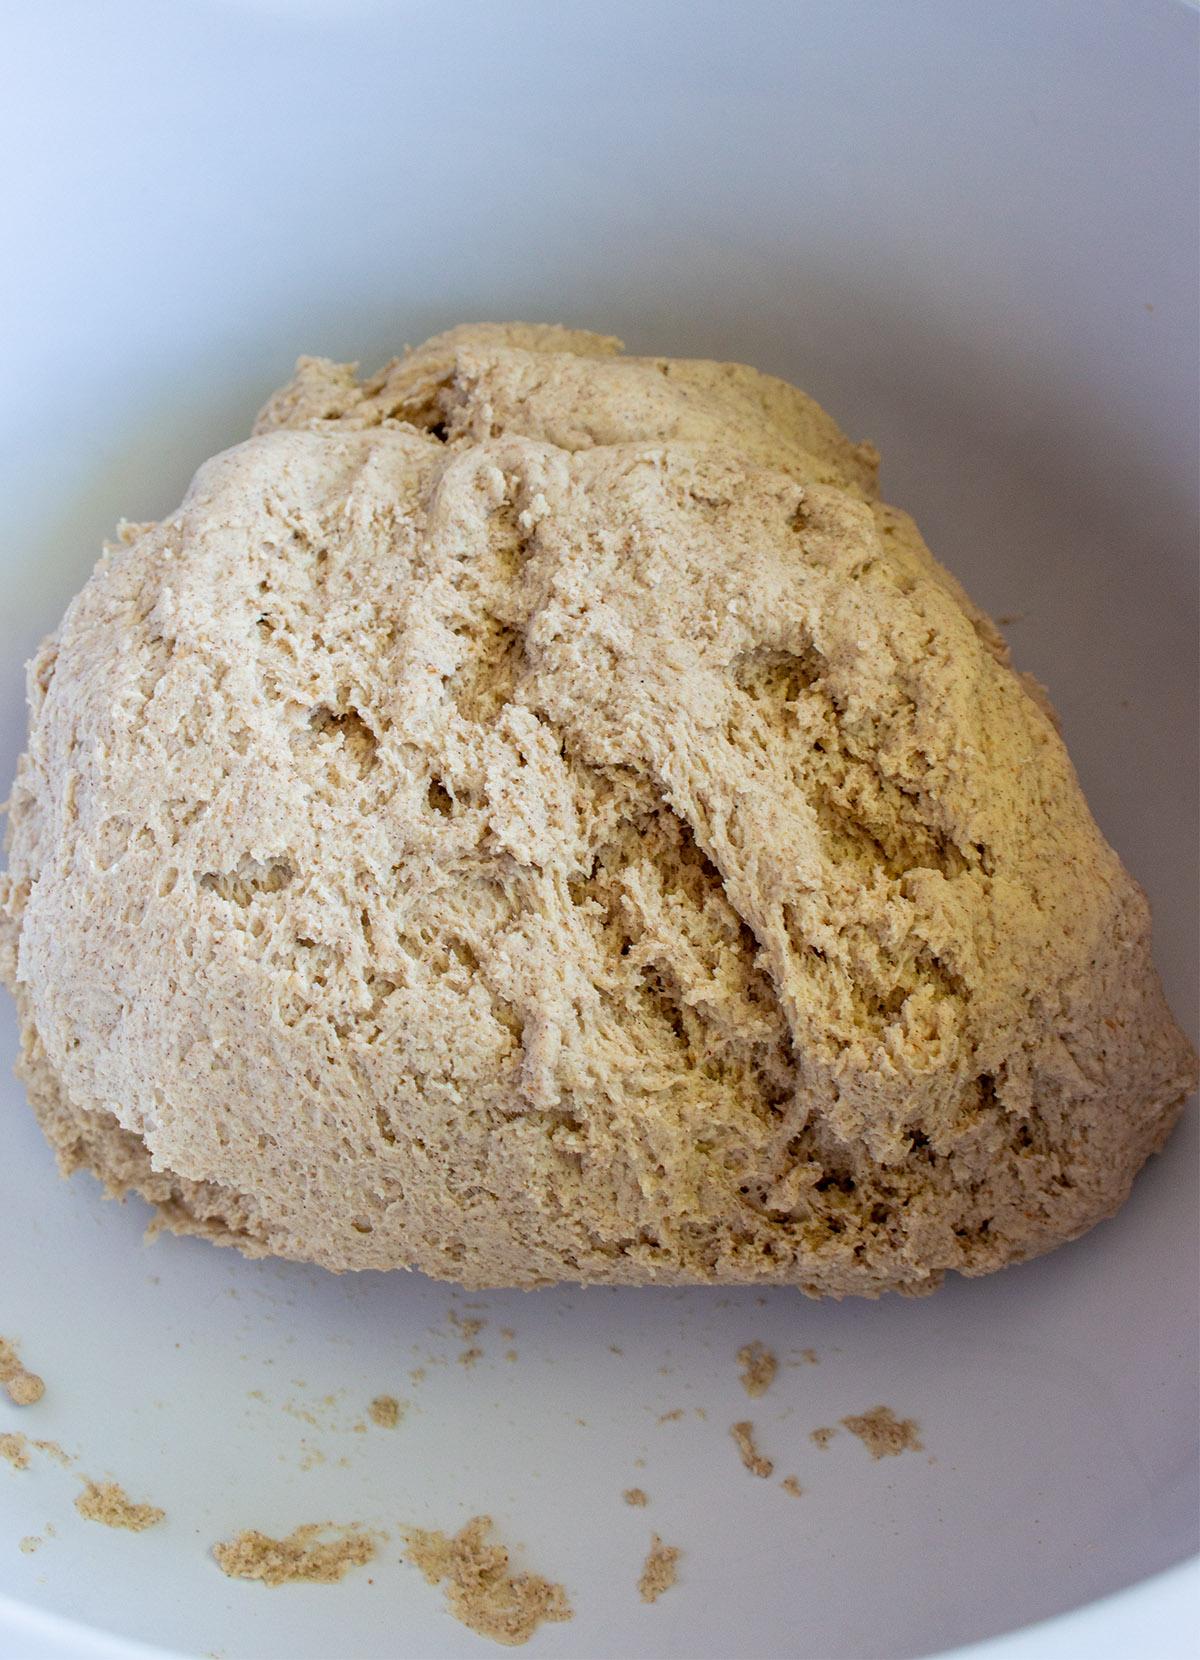 glutenfreier Brotteig